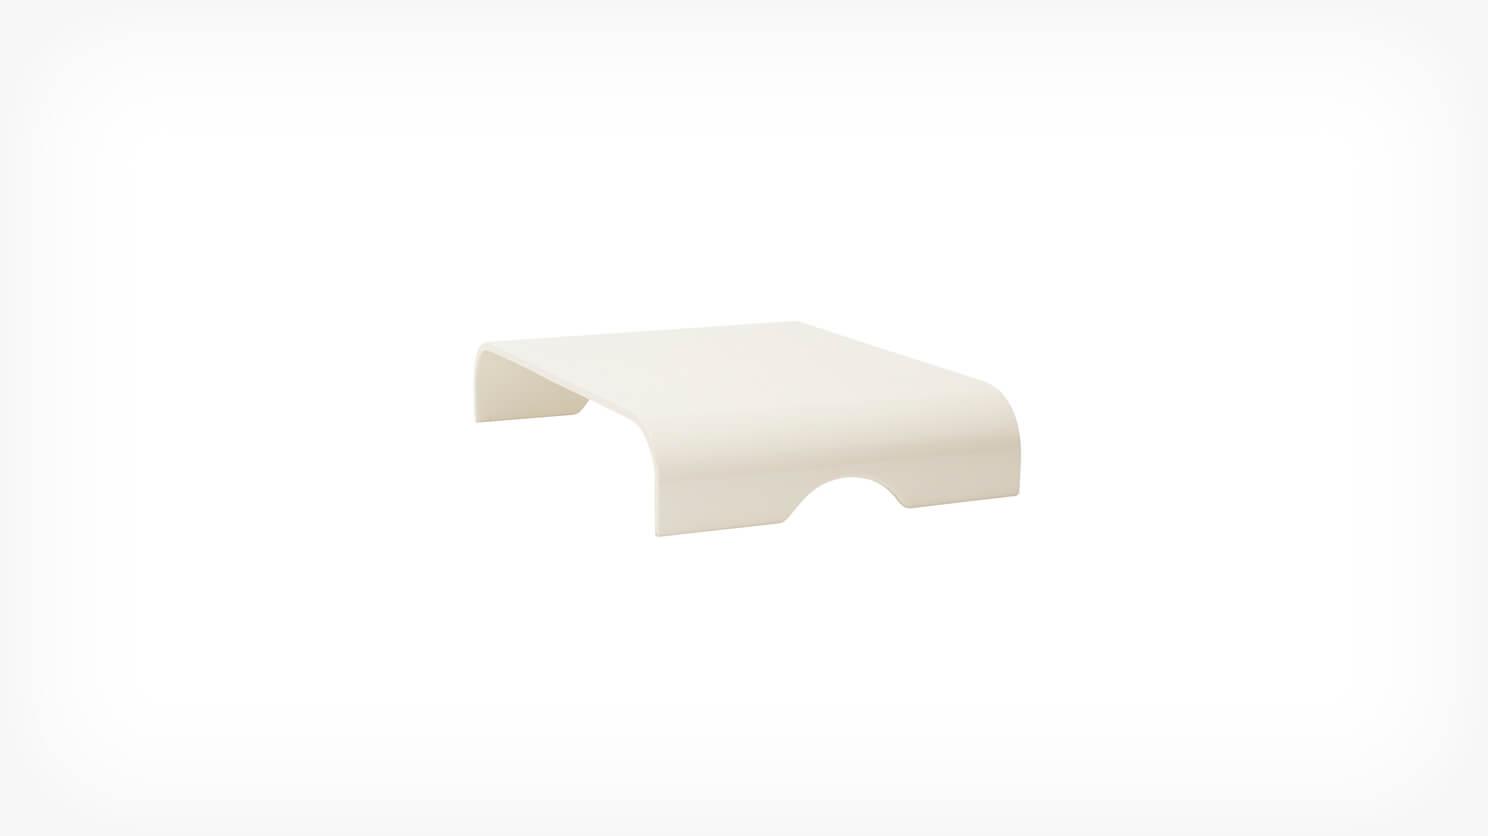 3020 101 1 01 tray ottoman tray onyx corner view 1